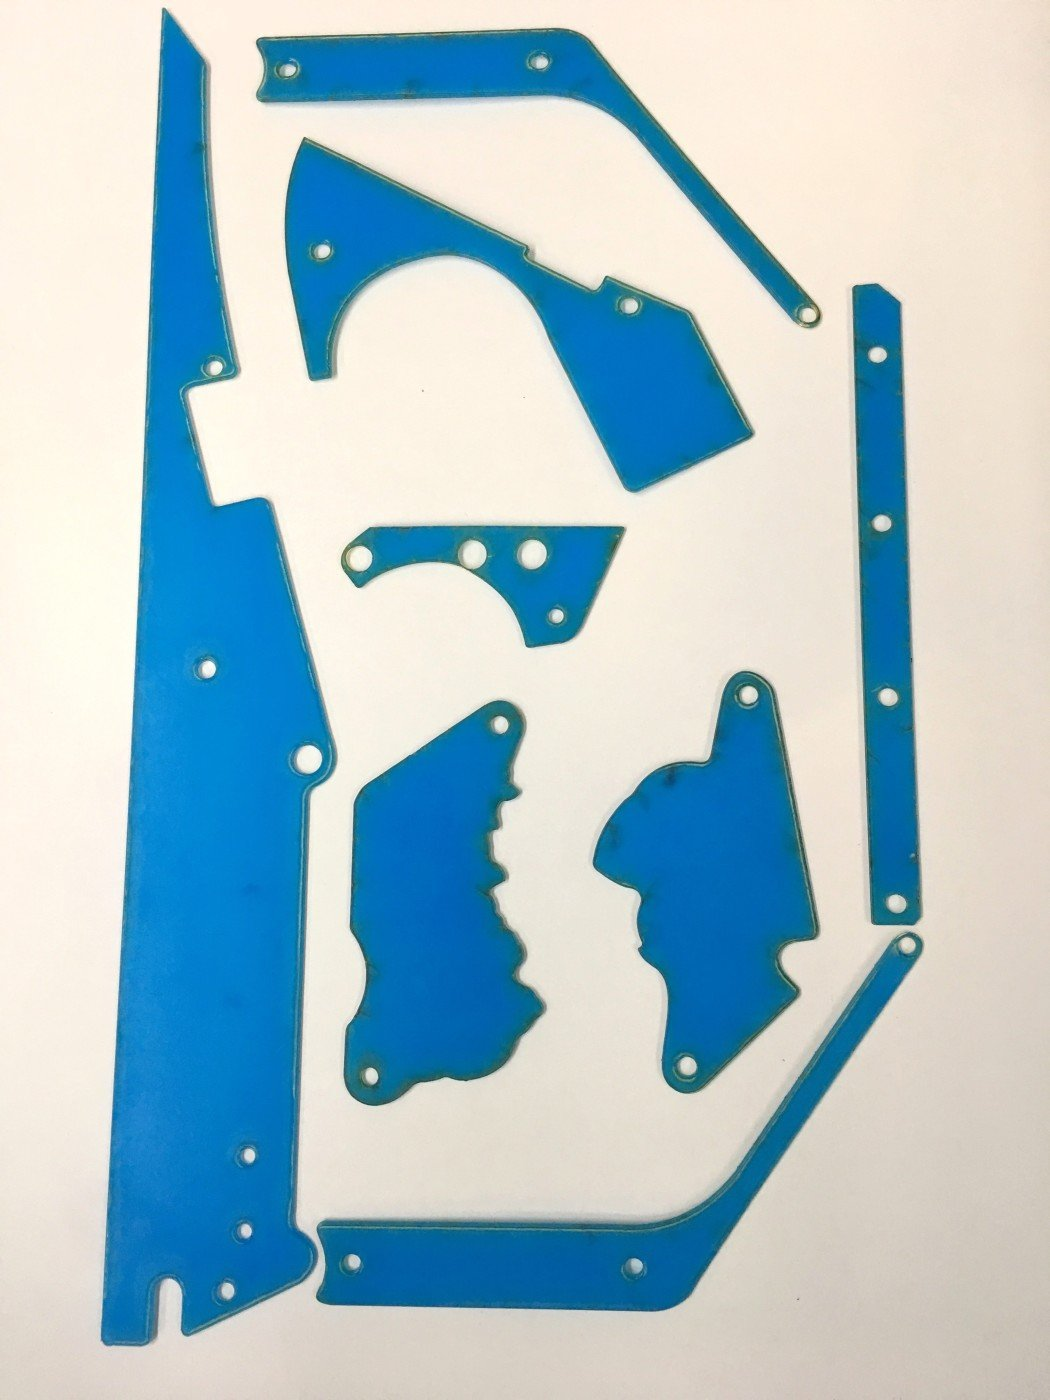 Deadpool Stern Pinball Machine - Clear 8 Piece Plastic Protector Set